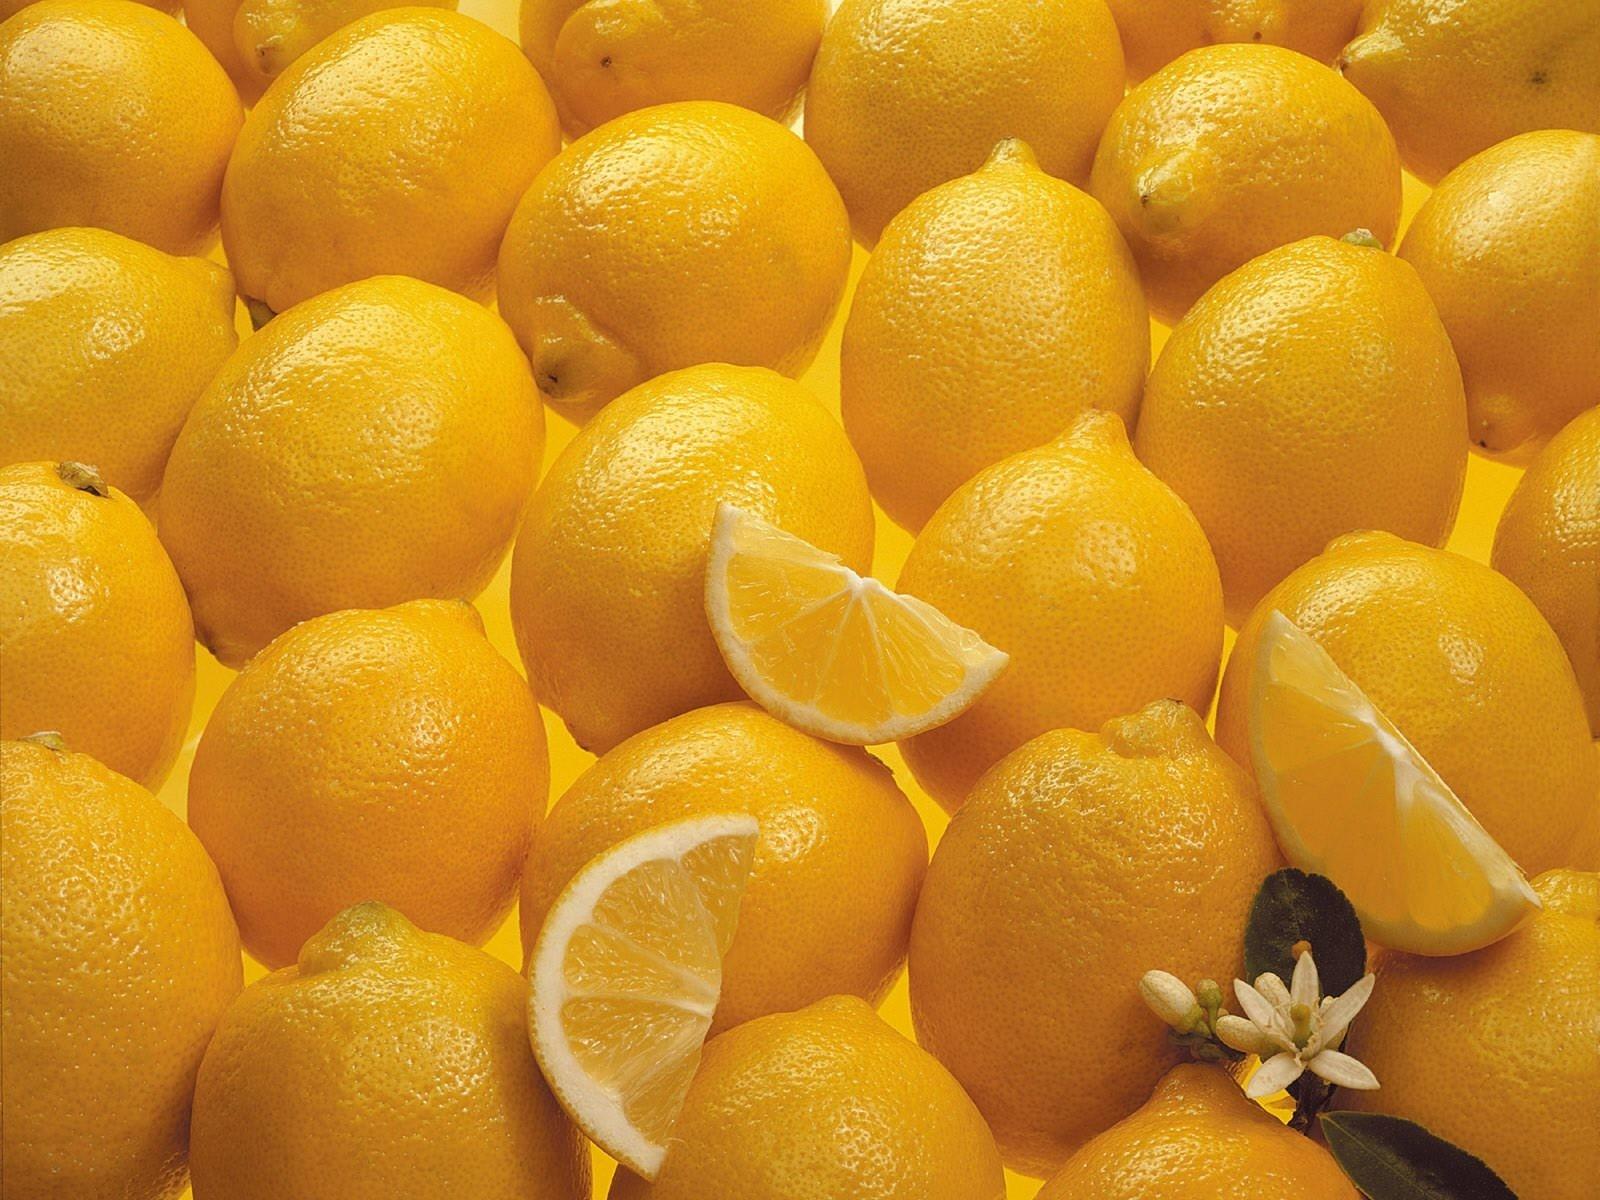 Wallpaper Fruit Yellow Lemons Citrus Background